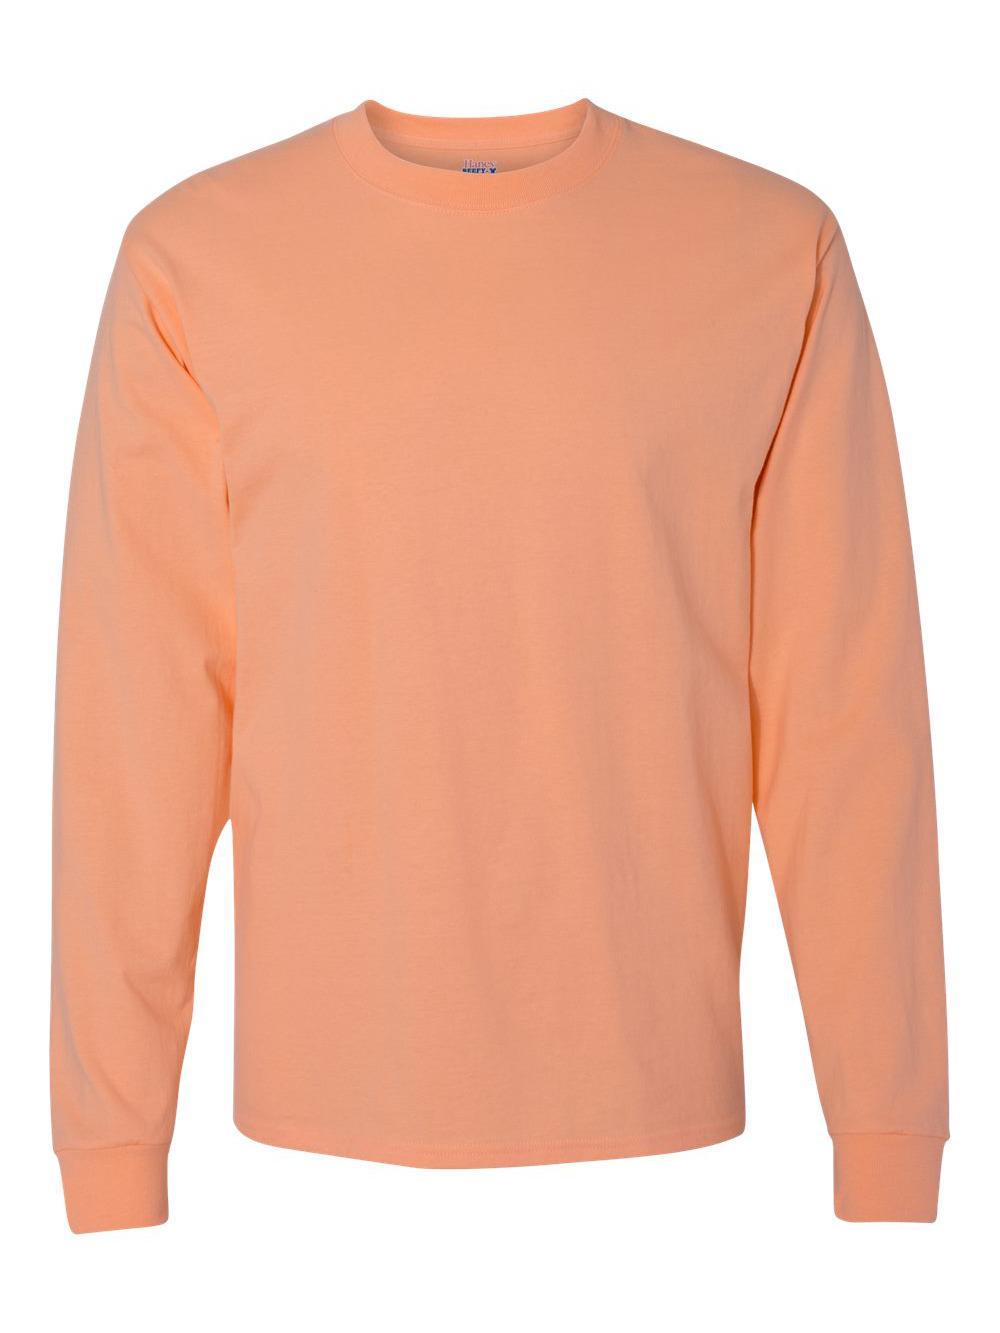 Hanes-Beefy-T-Long-Sleeve-T-Shirt-5186 thumbnail 12